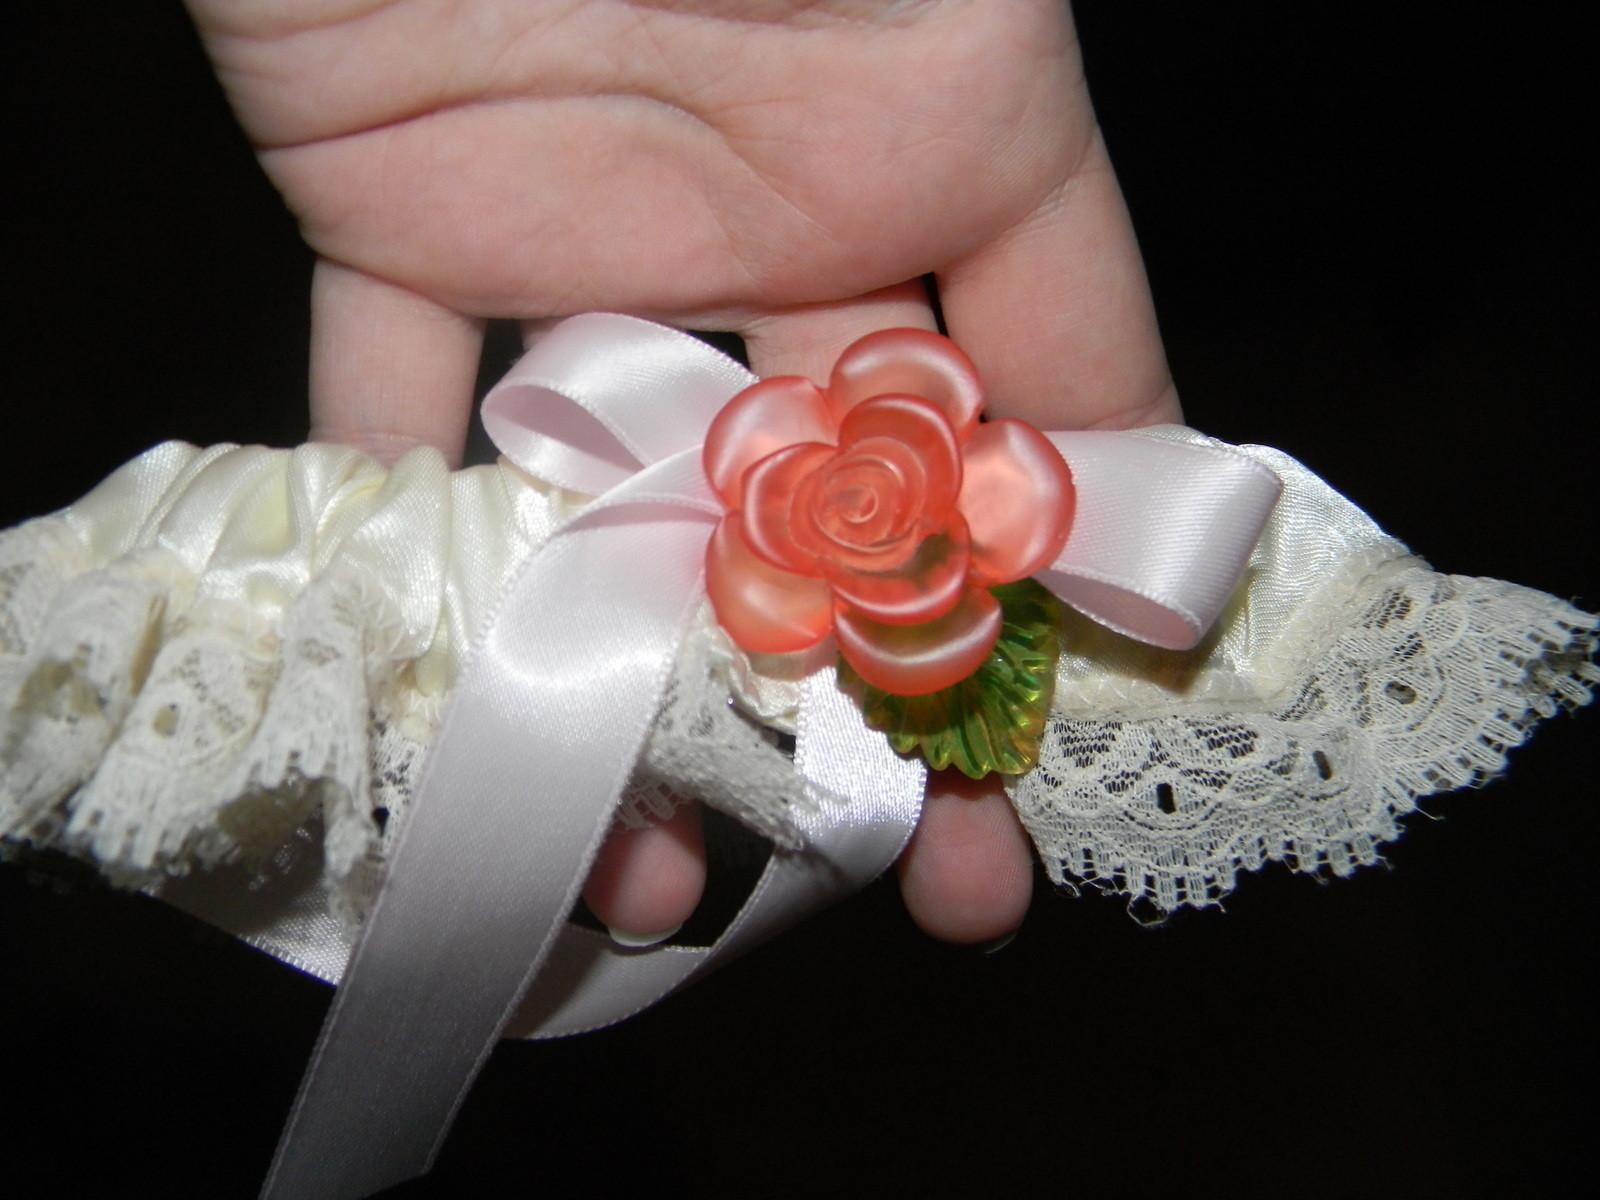 Wedding Garter · How To Make A Garter · Sewing On Cut Out